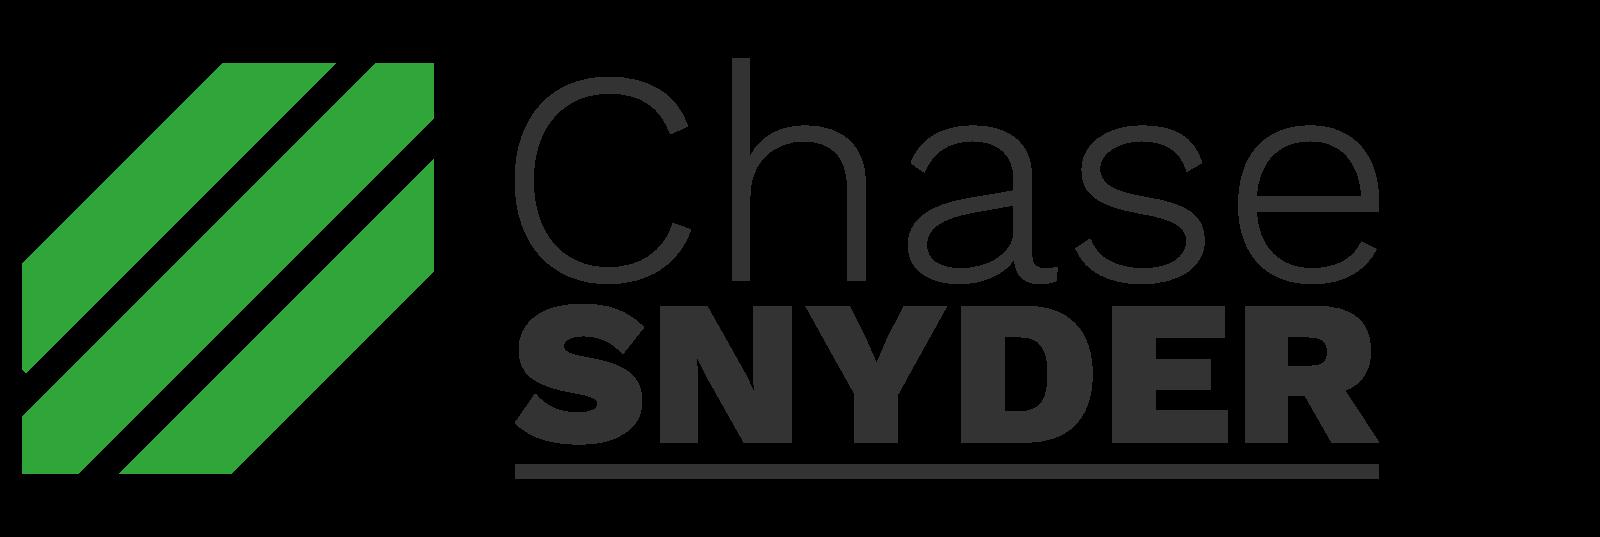 Chase Snyder